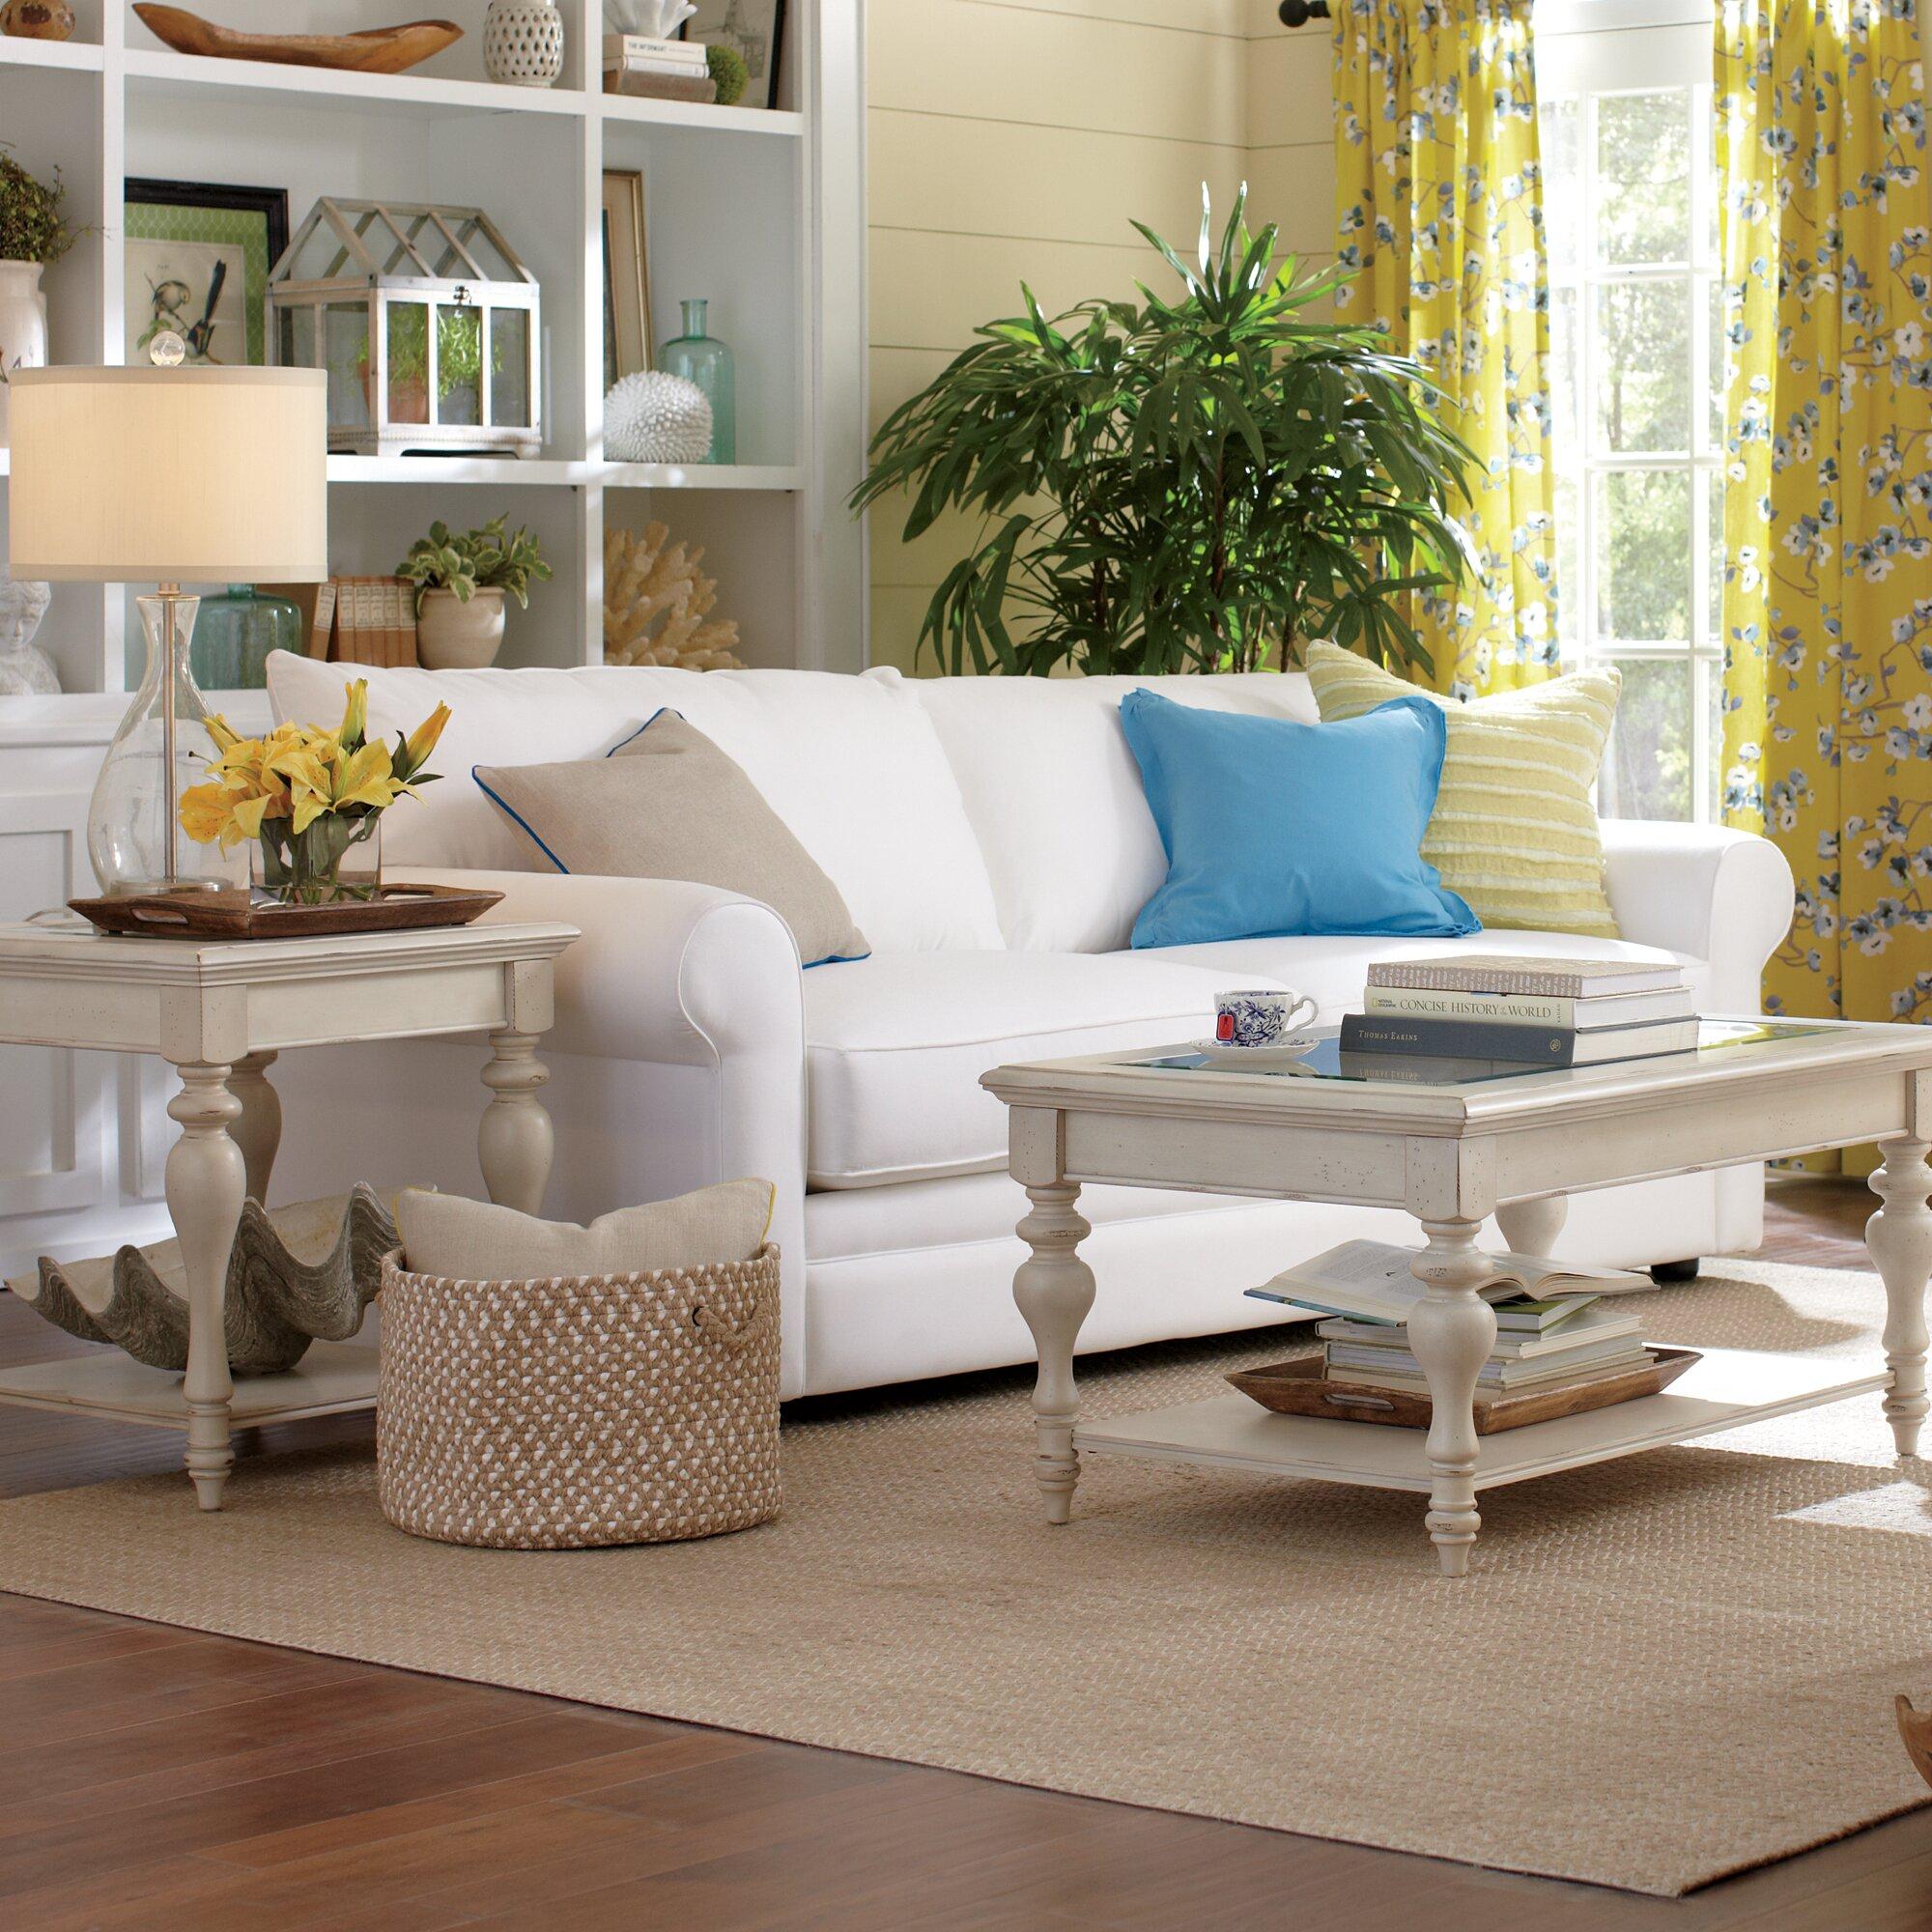 Sunburst Irest Sleeper Sofa Full Lane Furniture Lane Furniture